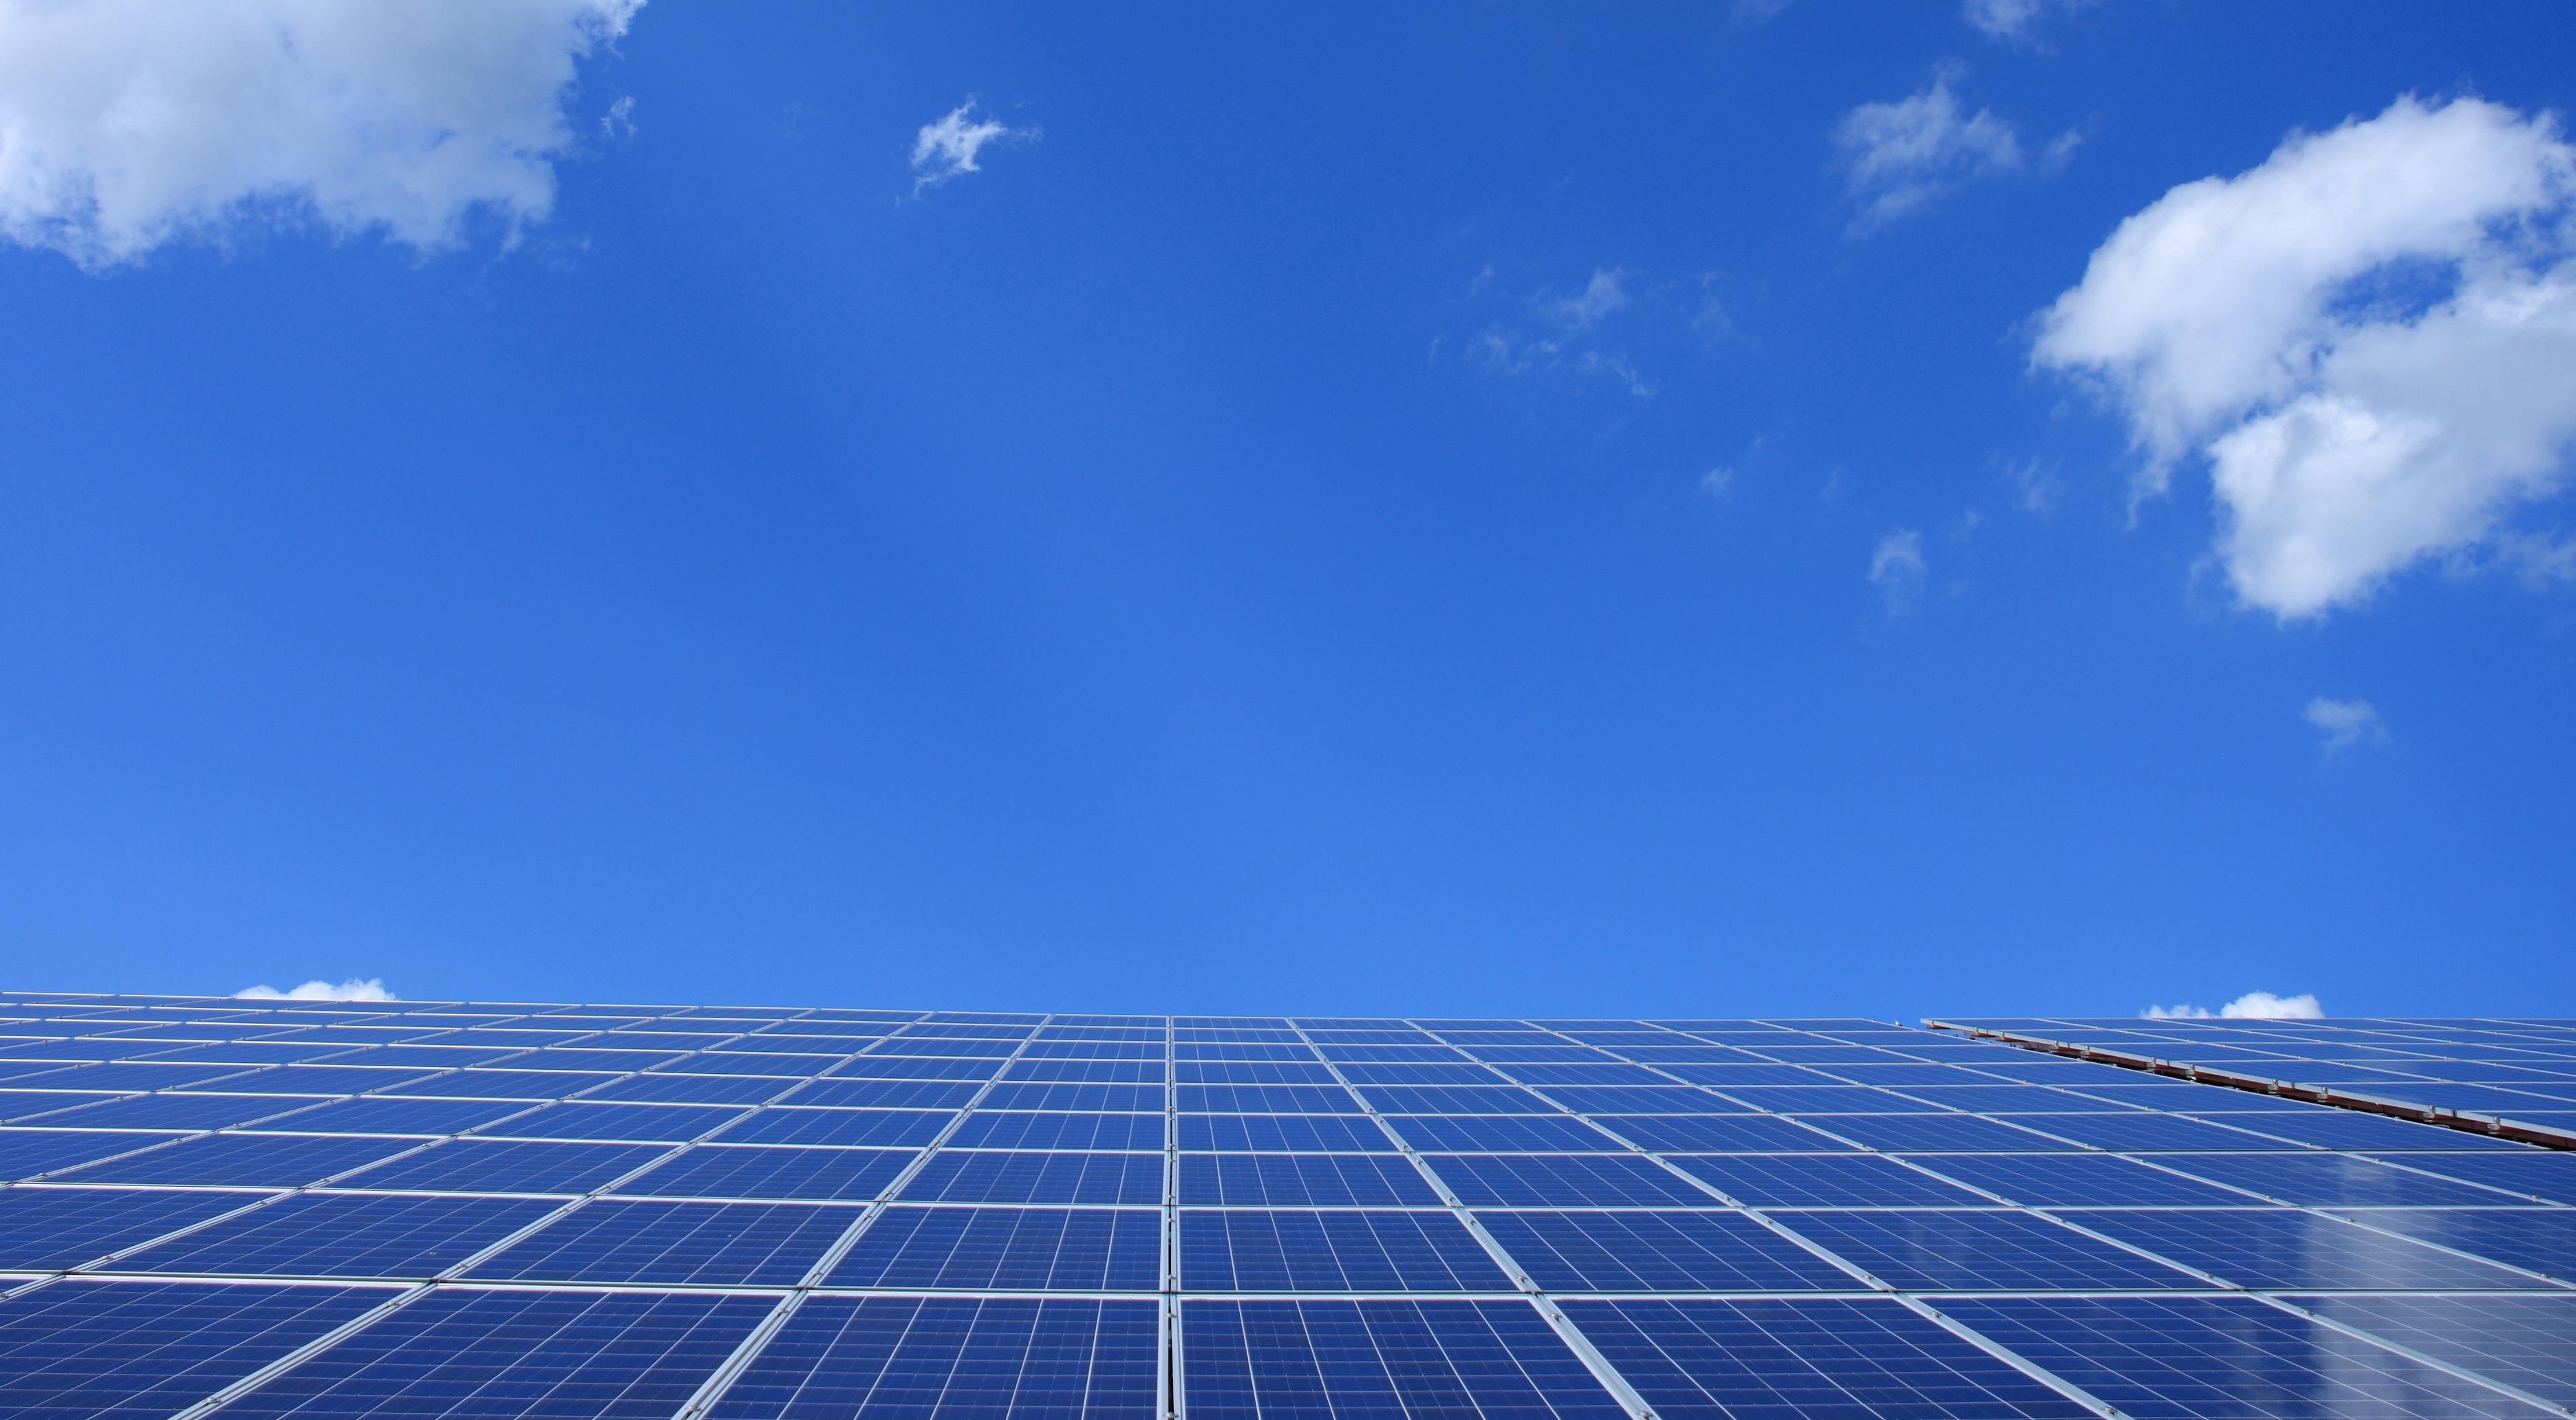 Blue Solar Panels Under Sunny Sky